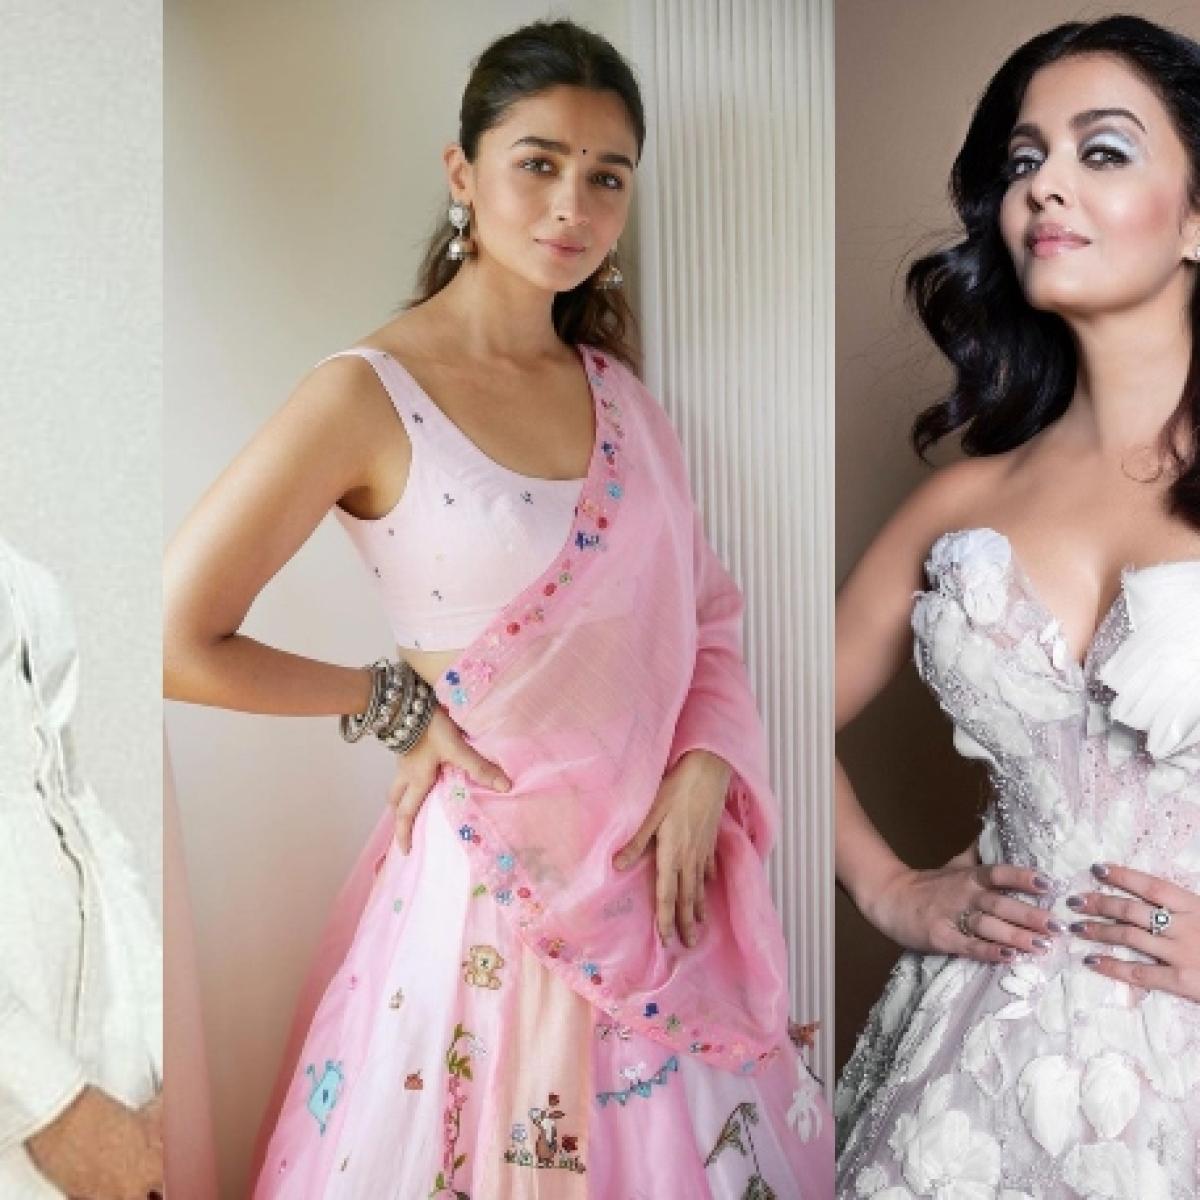 Sanjay Leela Bhansali's 'Heera Mandi' to feature Alia Bhatt, Aishwarya Rai Bachchan, Deepika Padukone?